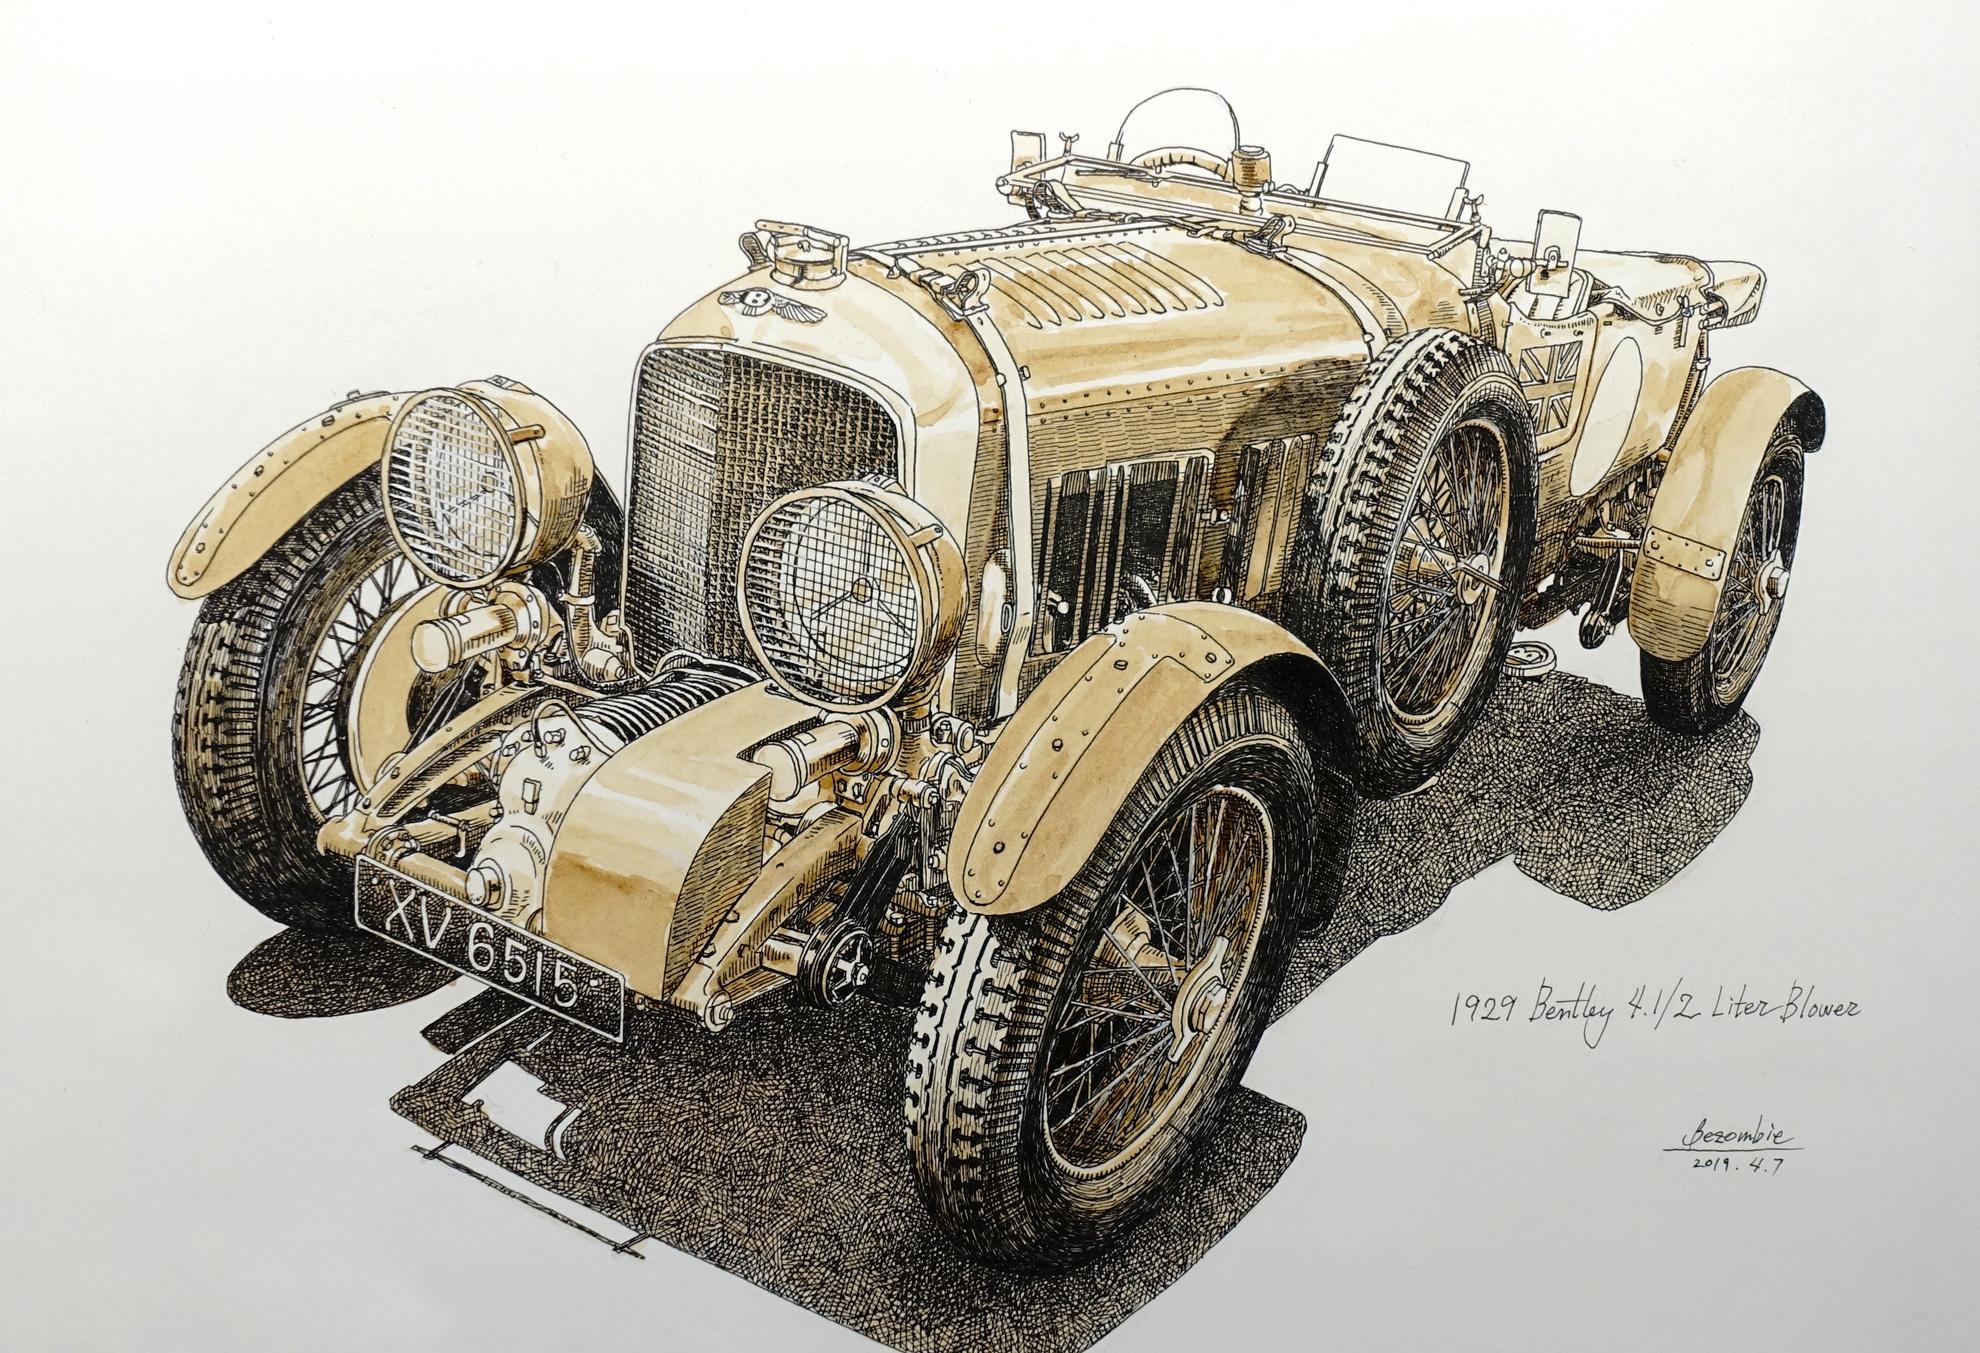 Bentley 4.1/2Liter Blower